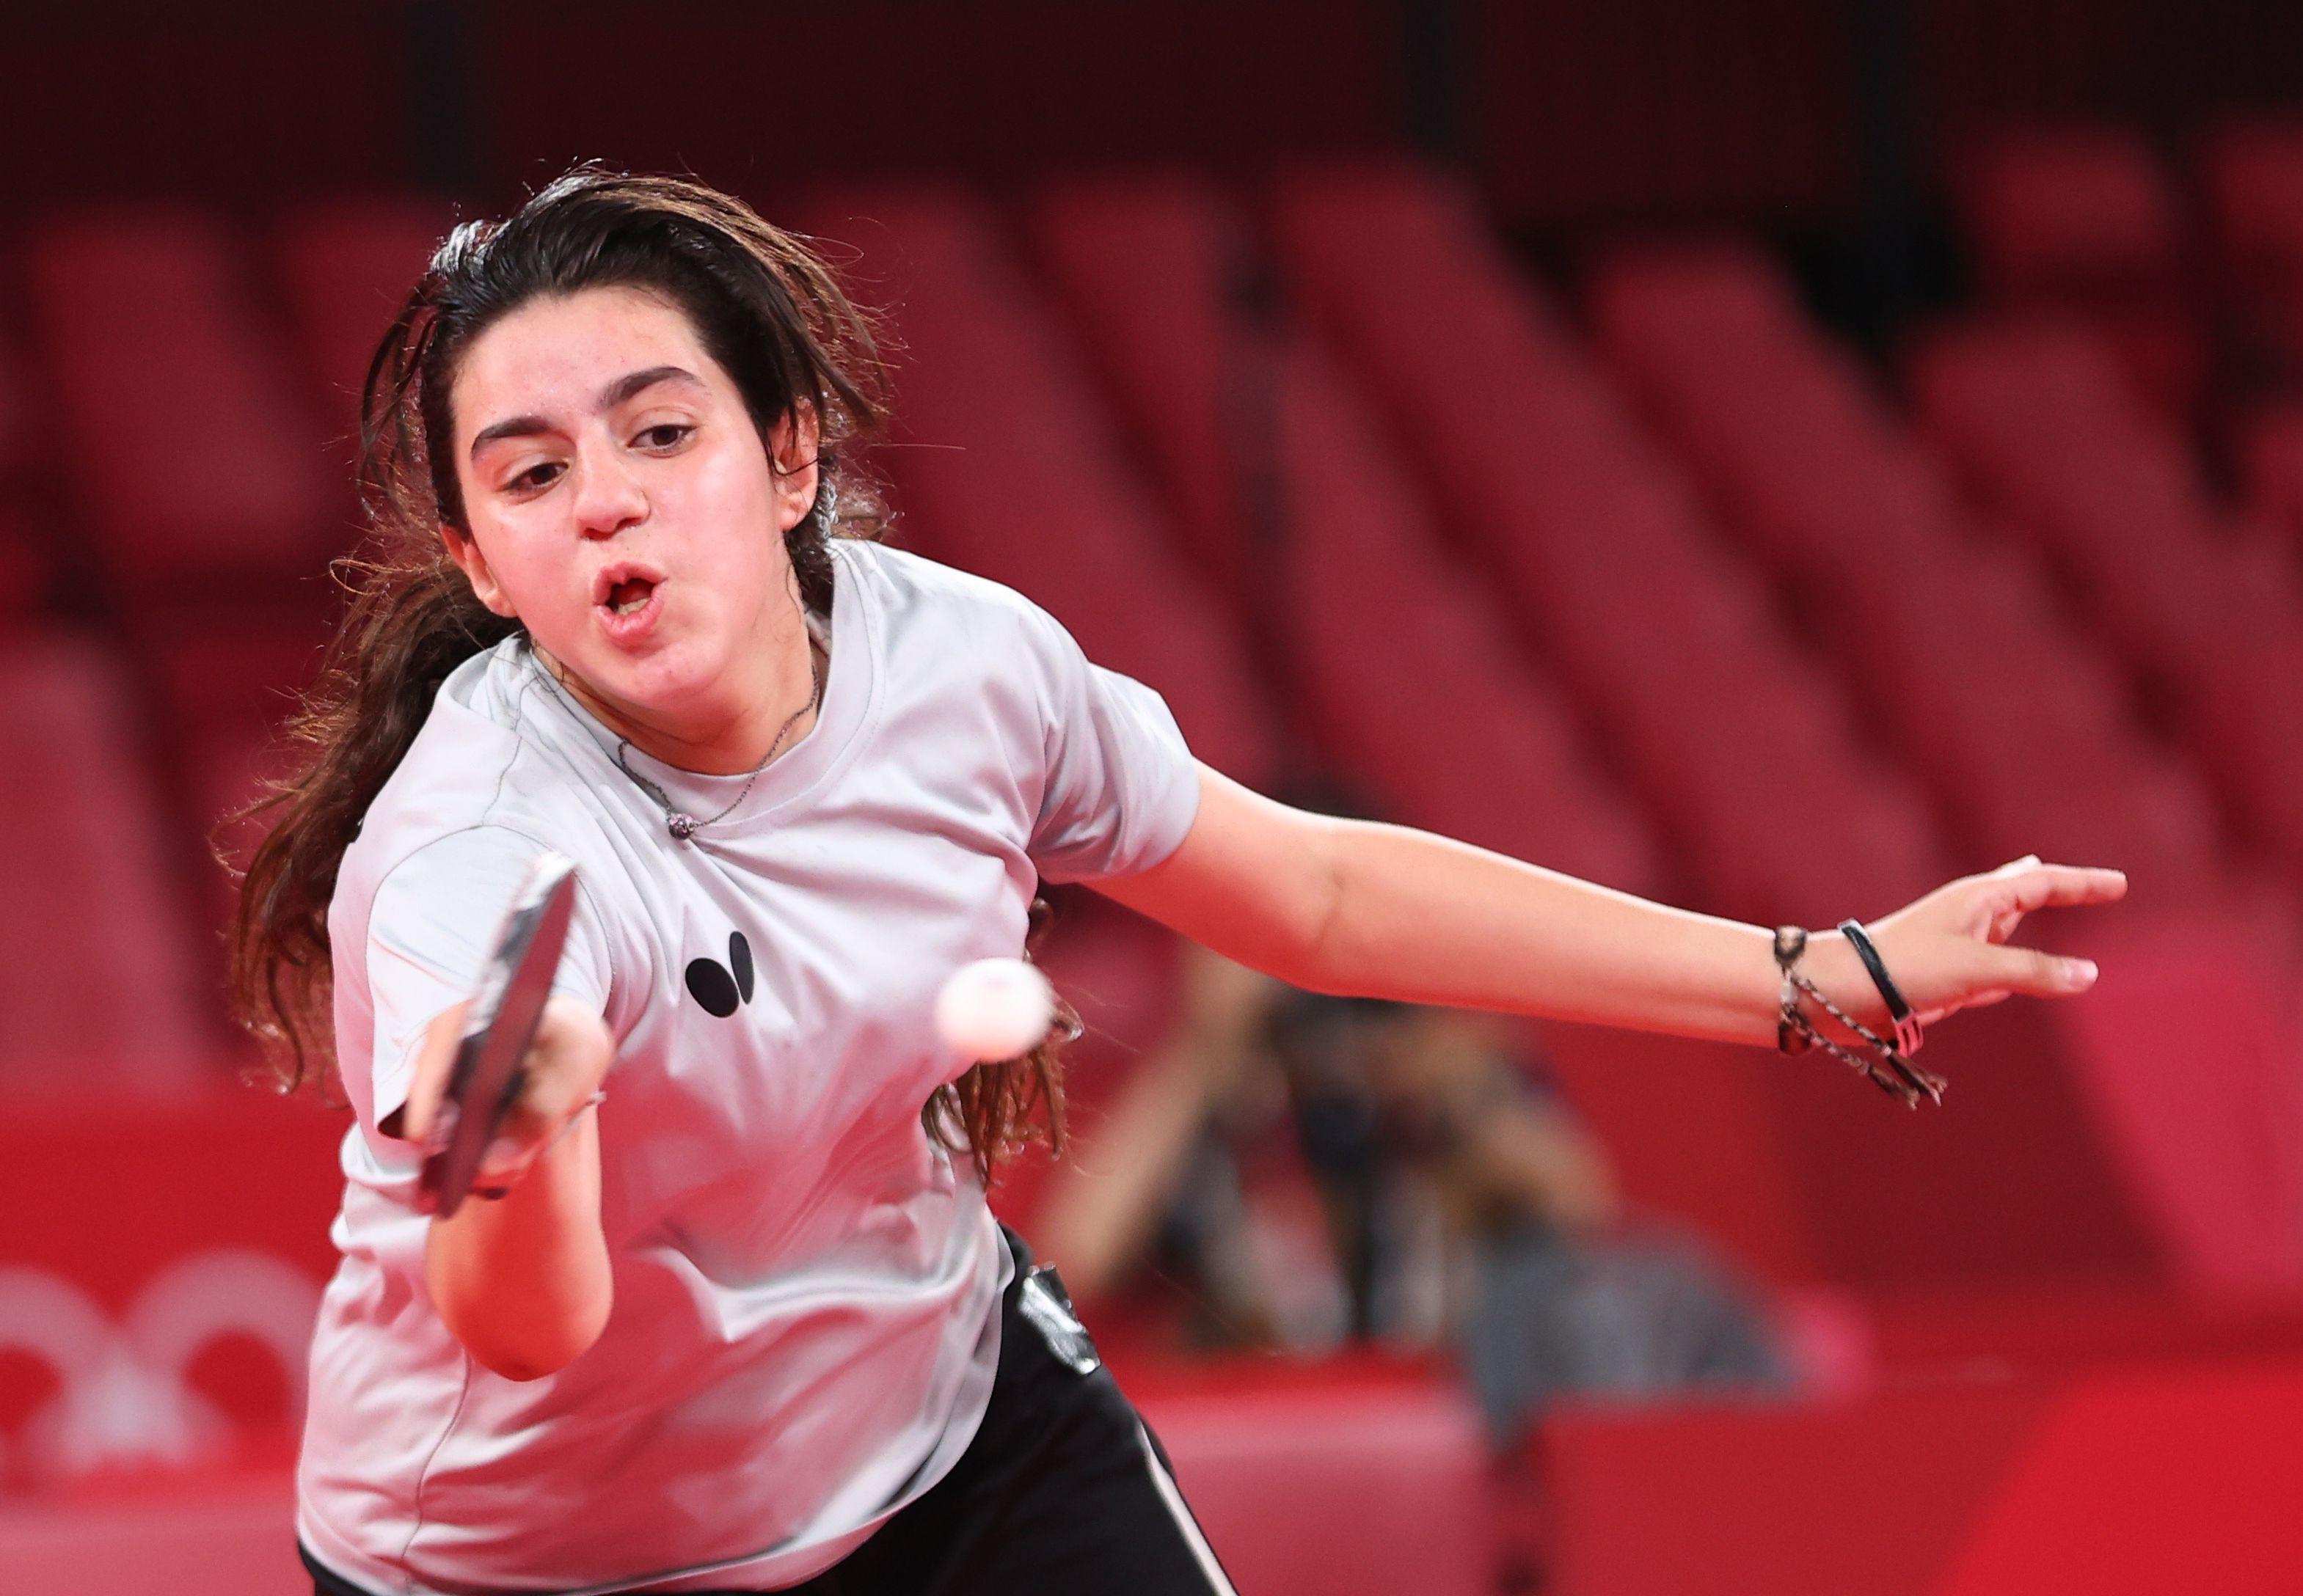 Tokyo 2020 Olympics - Table Tennis - Women's Singles - Preliminary Round - Tokyo Metropolitan Gymnasium - Tokyo, Japan - July 24, 2021.  Hend Zaza of Syria in action against Jia Liu of Austria REUTERS/Luisa Gonzalez